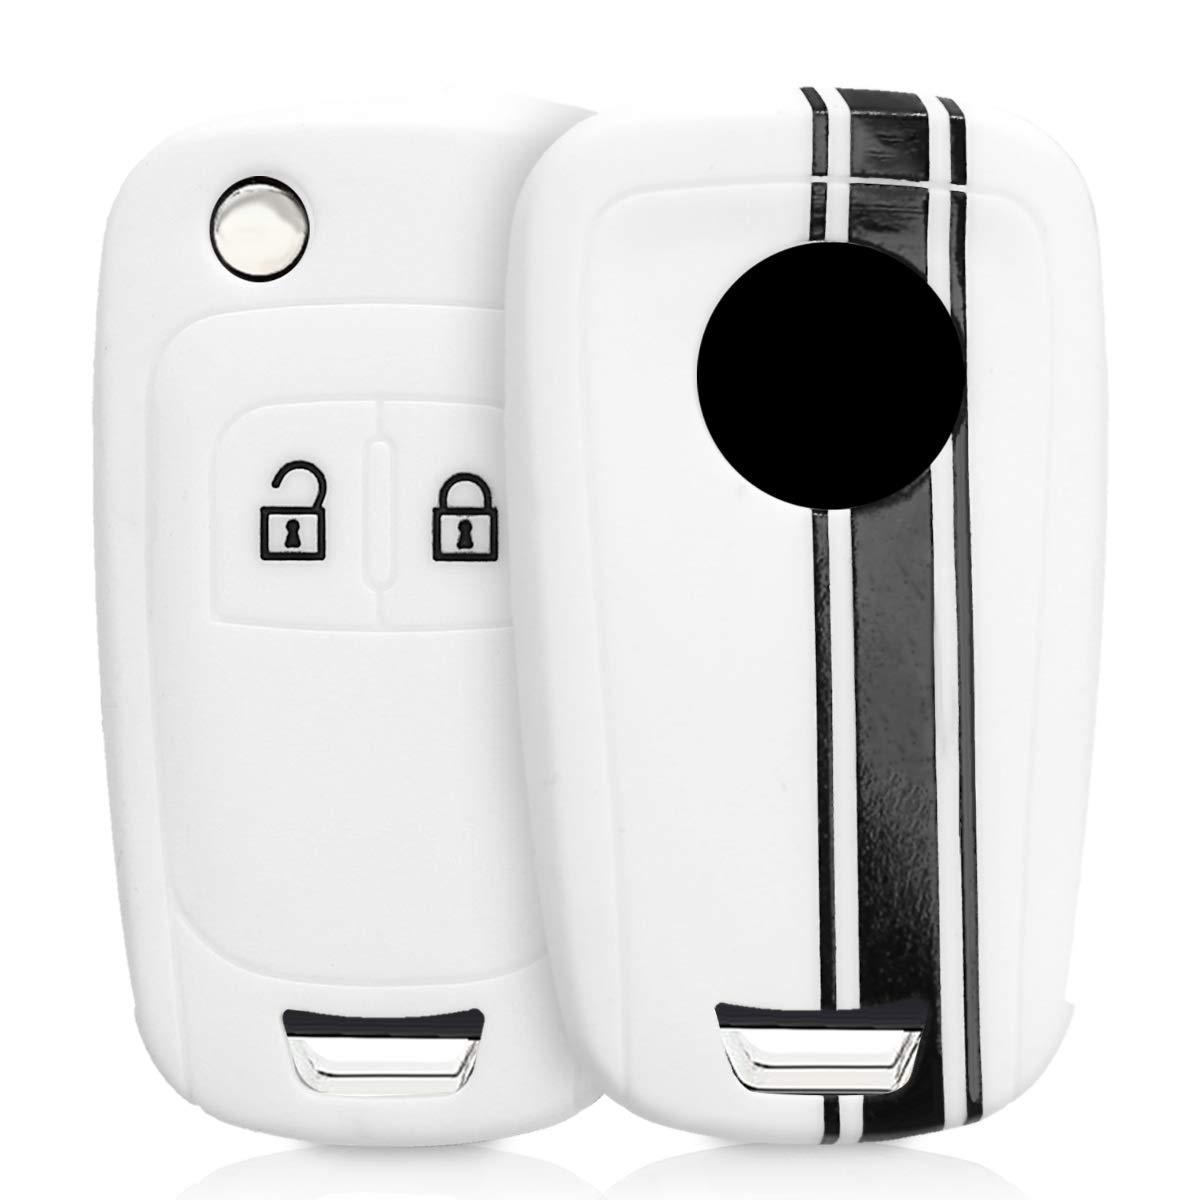 kwmobile Funda para Llave Plegable de 2 Botones para Coche Opel Chevrolet - Carcasa Protectora Suave de Silicona - Case de Mando de Auto con diseño de ...